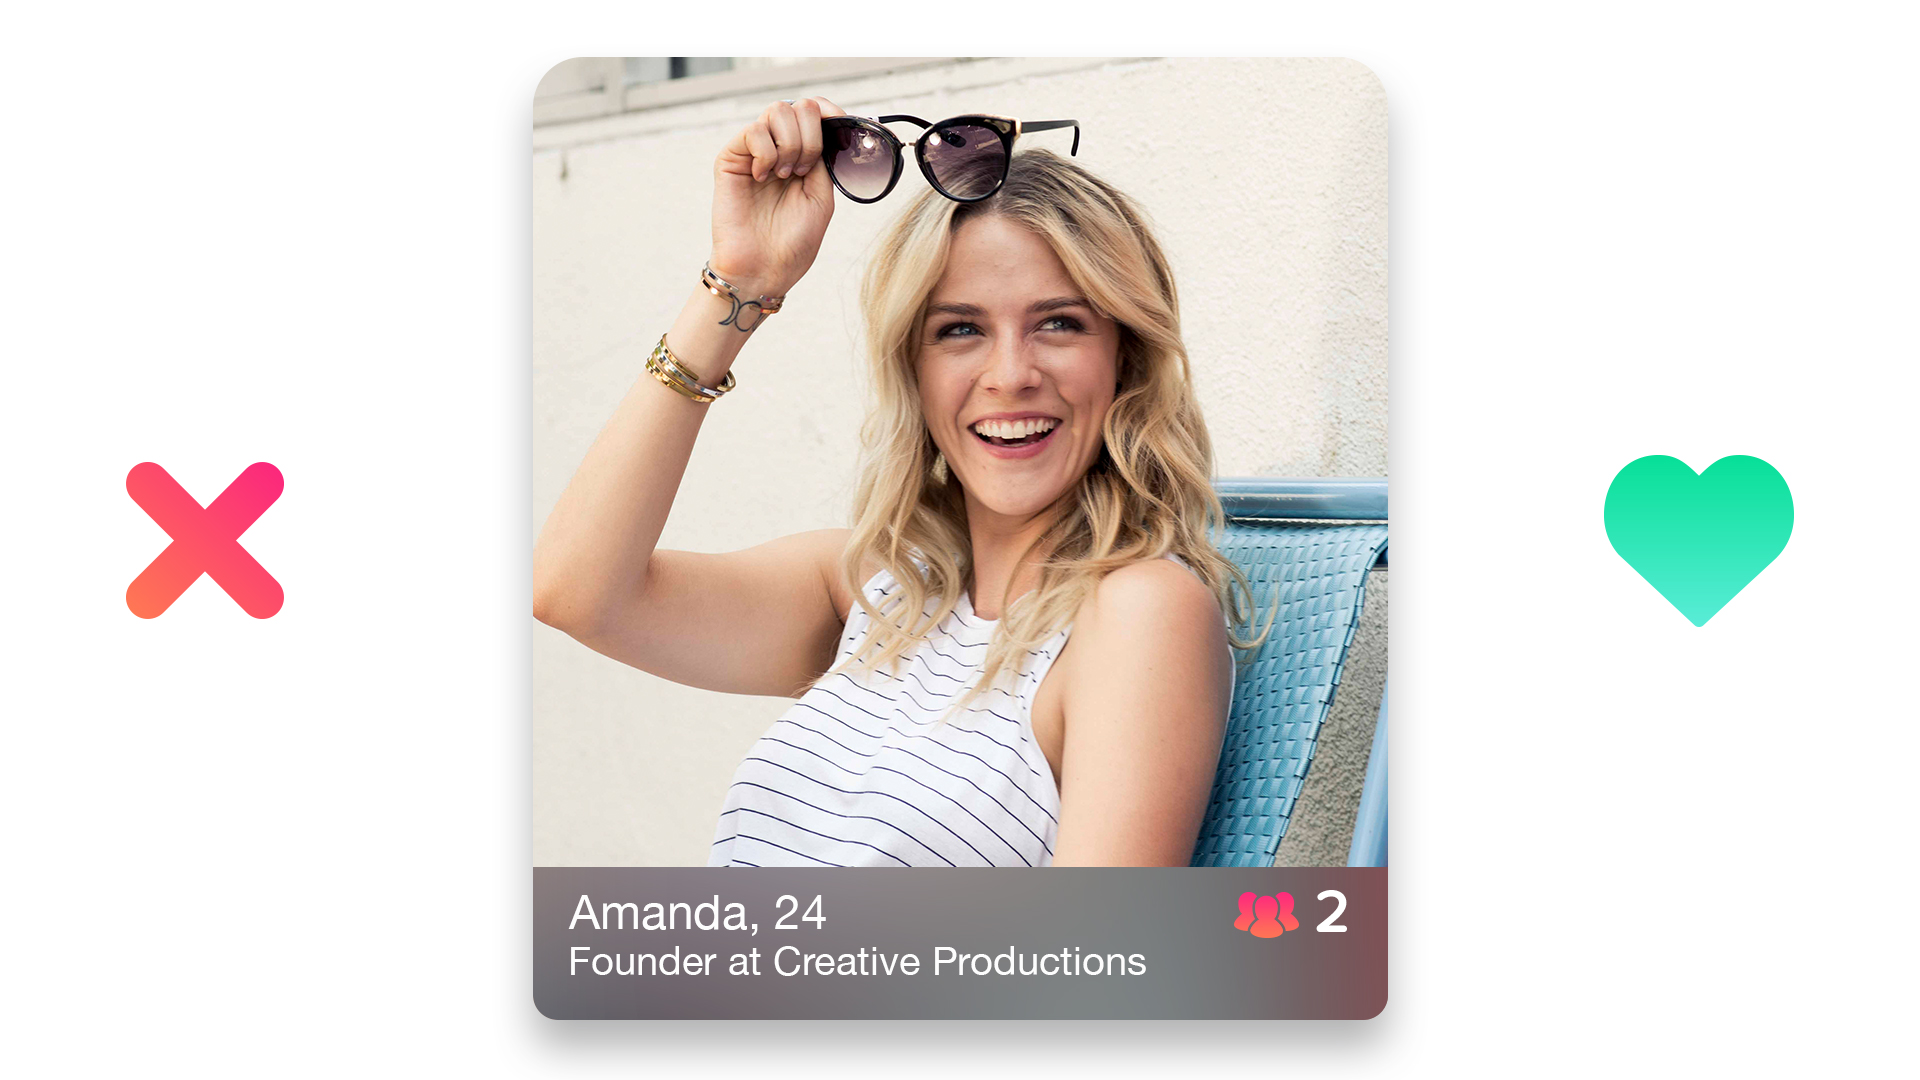 Tinder - Dating New People screenshot 7